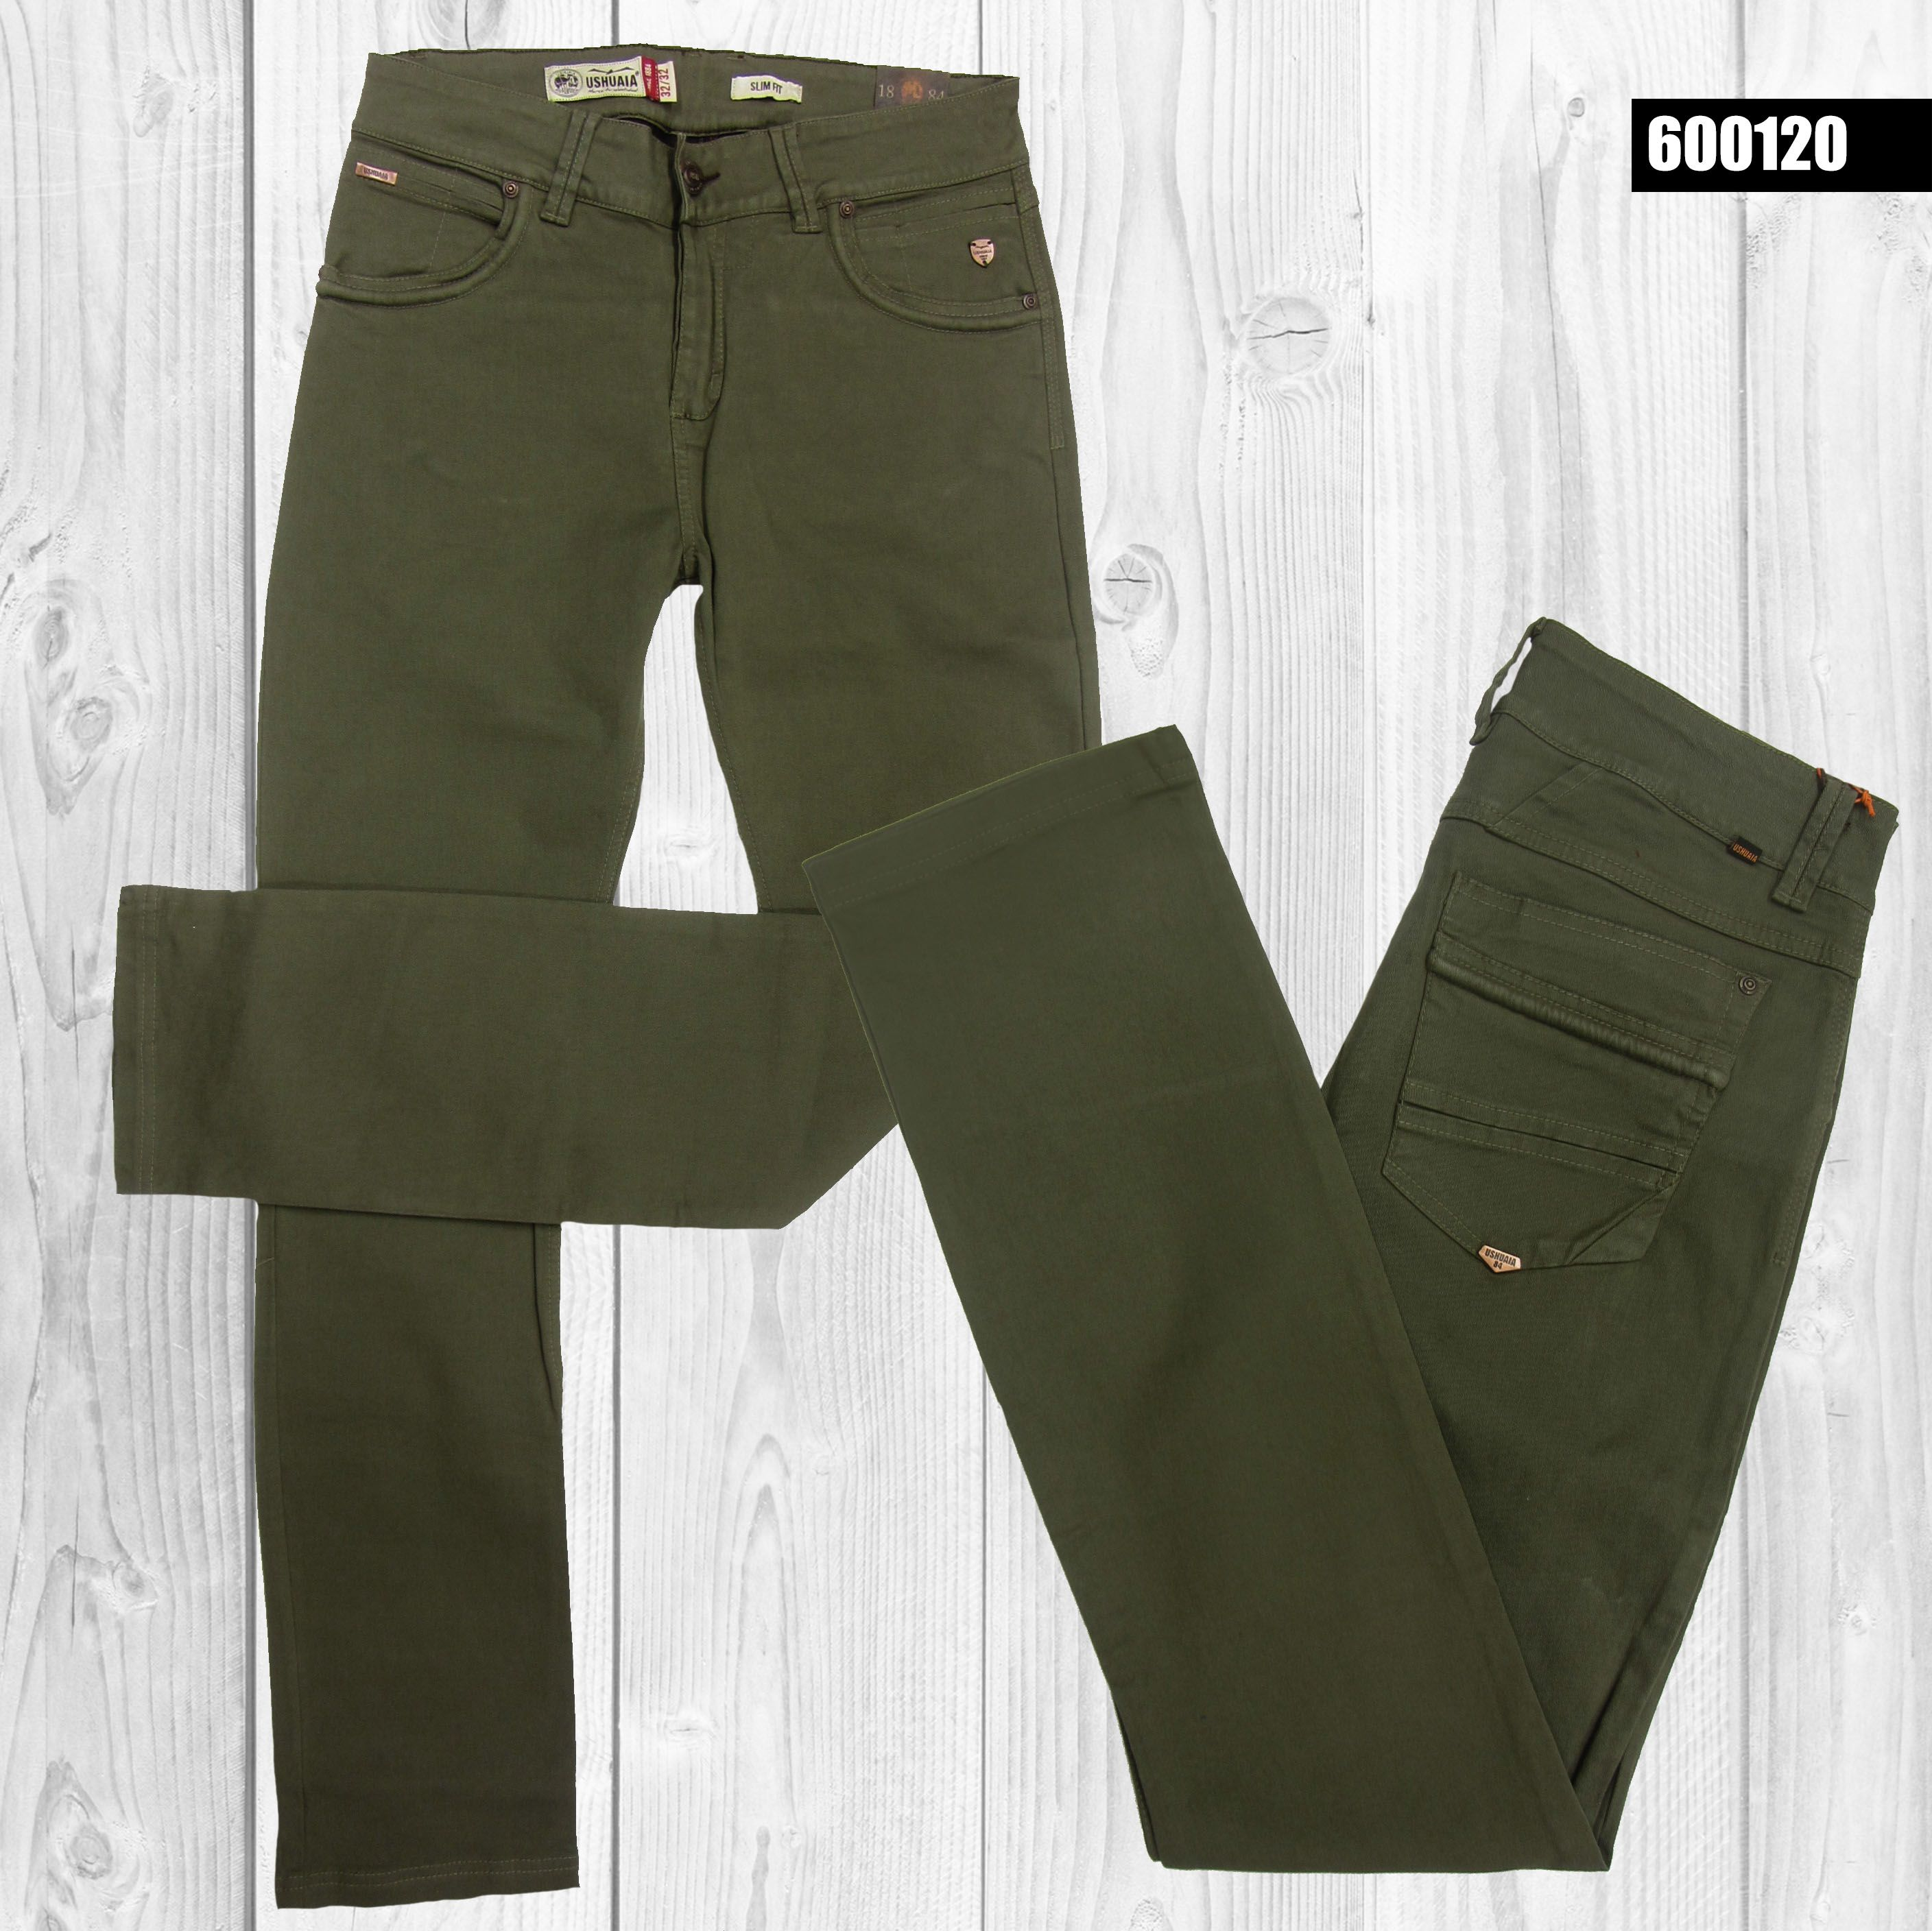 Pantalon Hombre Color Verde Militar 600120 Pantalon Hombre Ropa De Hombre Ropa